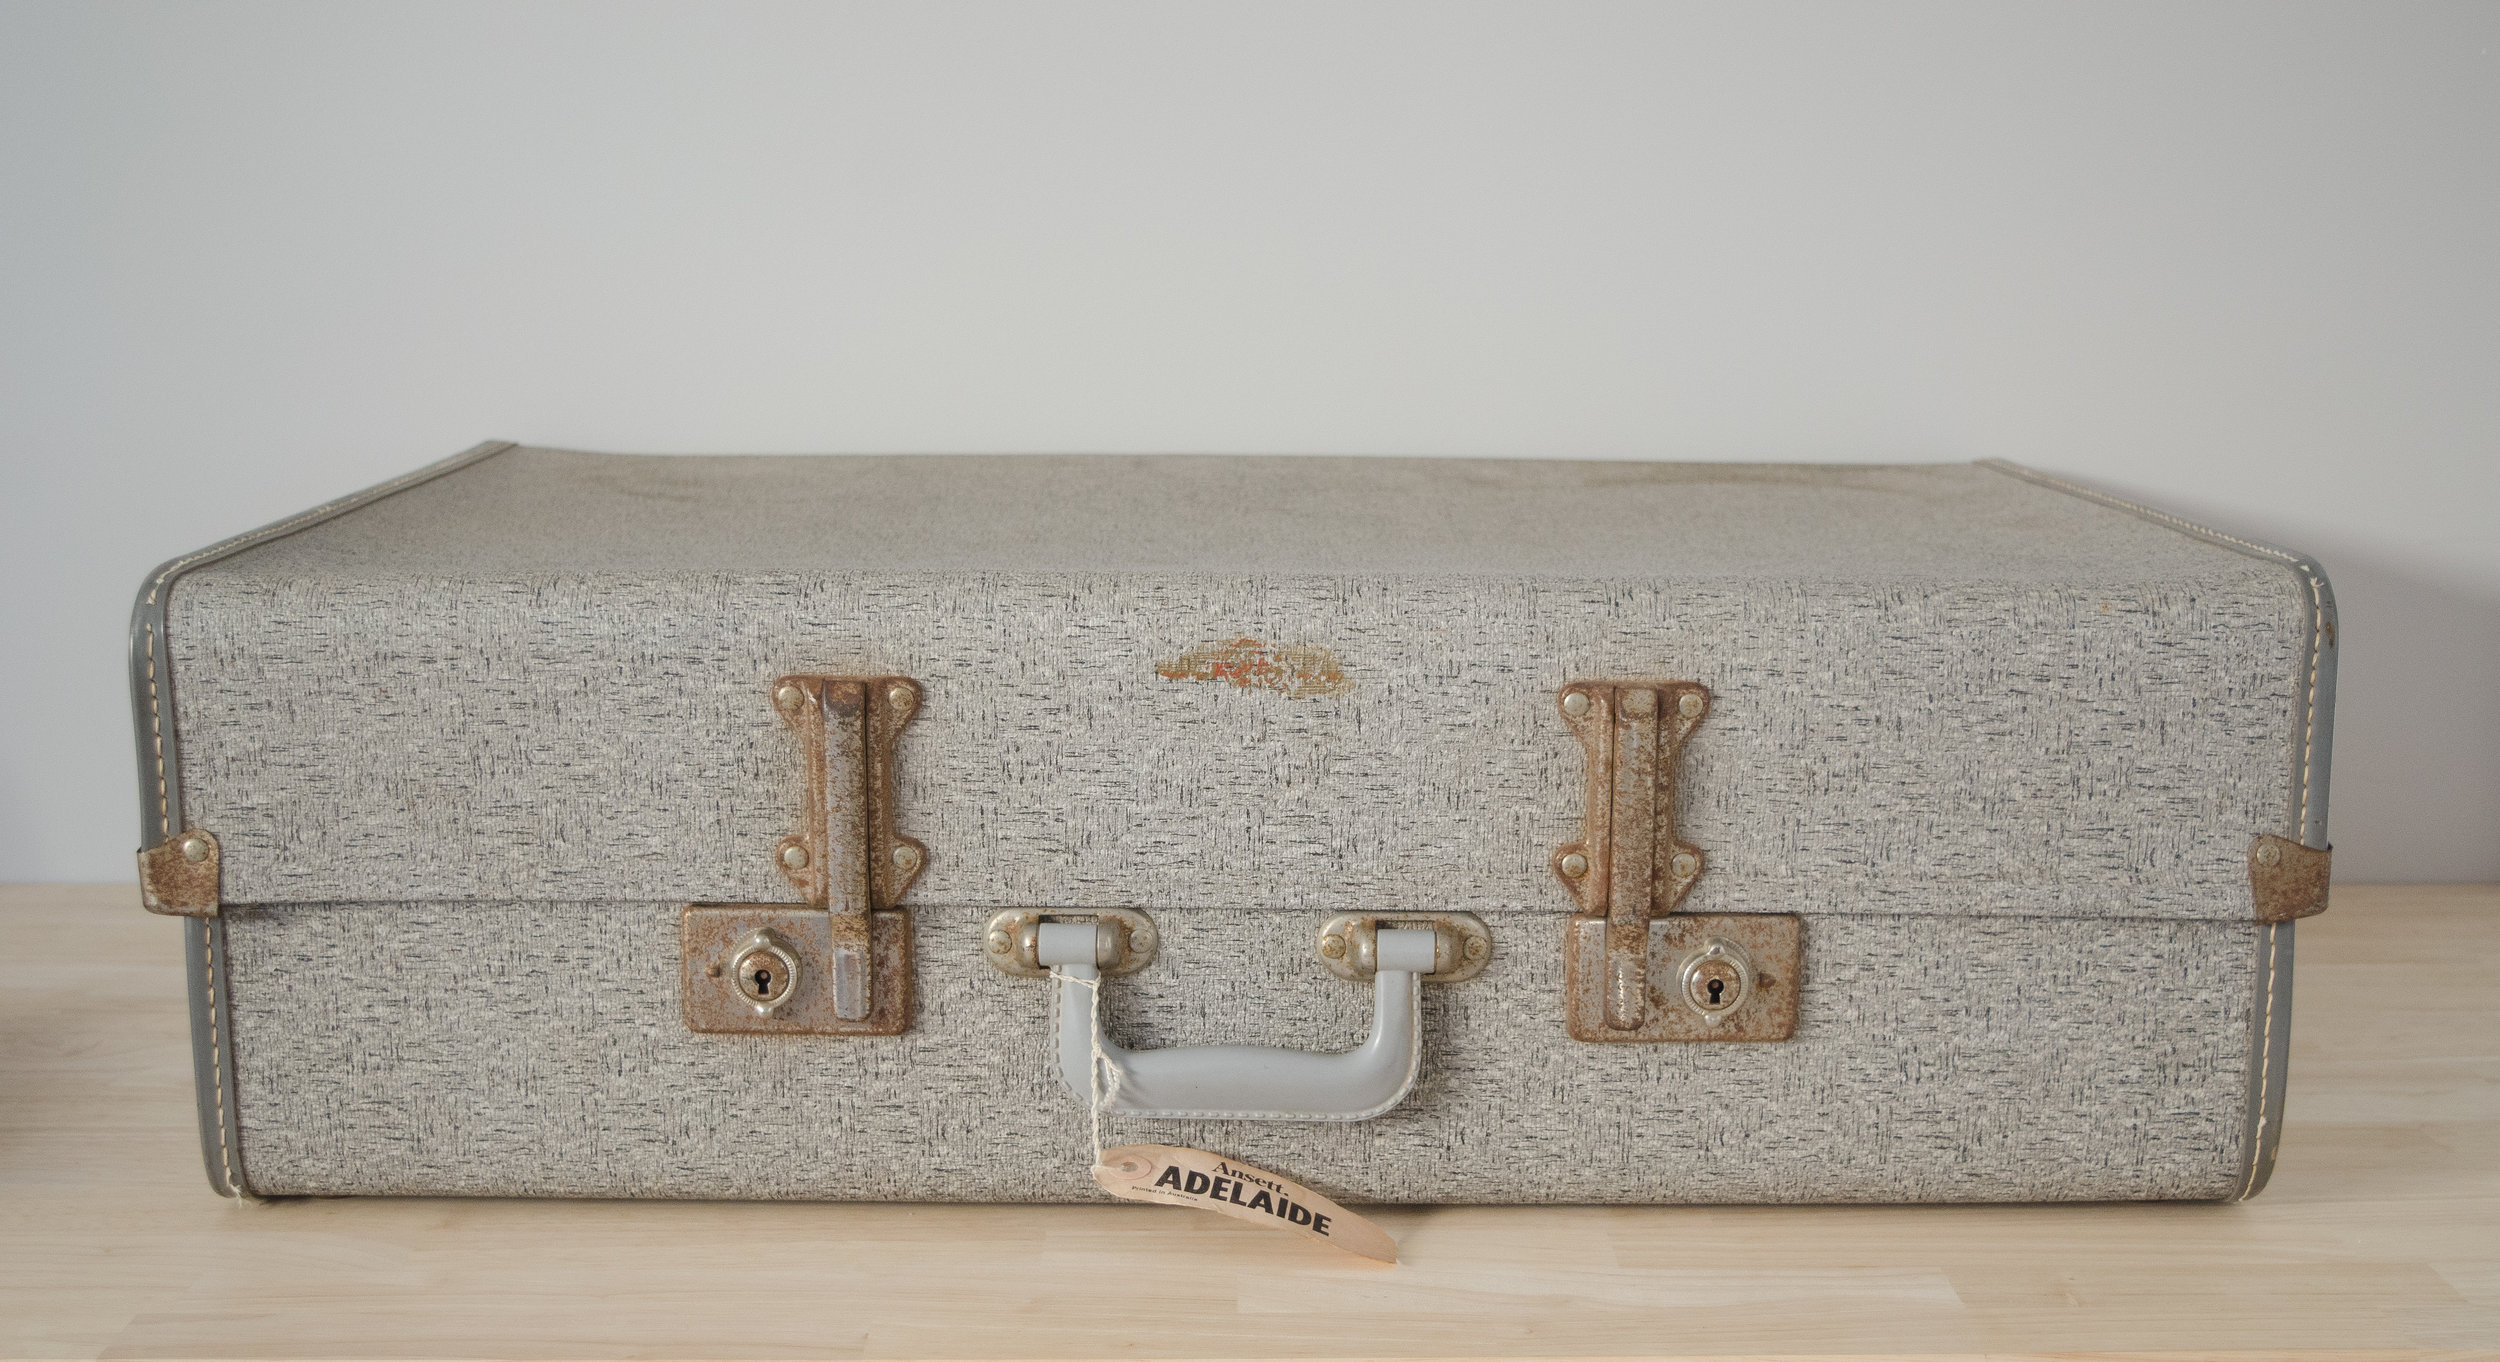 Grey Blizzard Suitcase -LARGE    $10.00 (3-day Hire)                                                  Quantity: 1